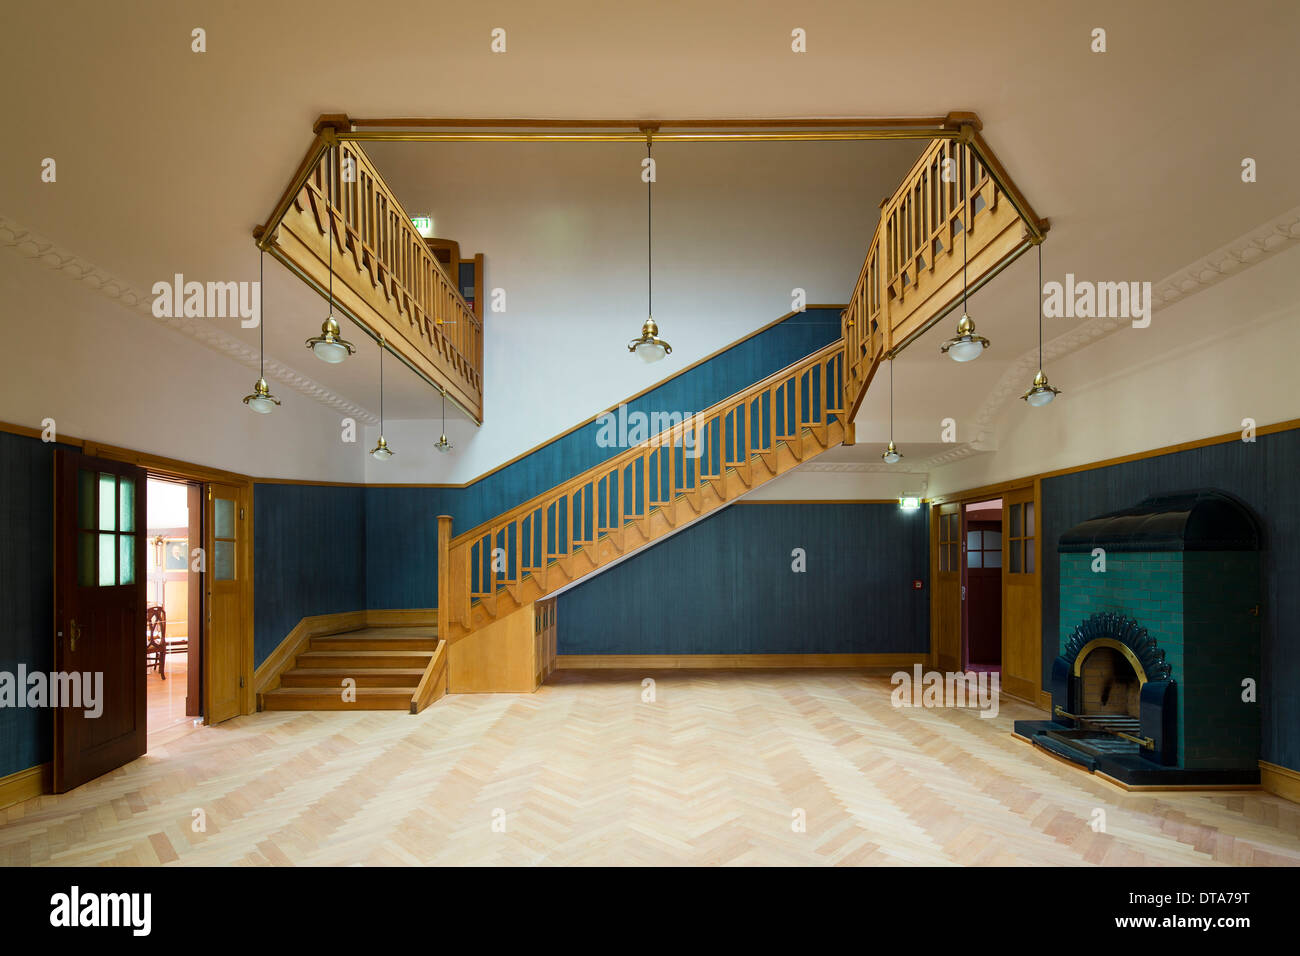 Villa treppenhaus modern  Chemnitz, Villa Esche Stock Photo, Royalty Free Image: 66608132 ...